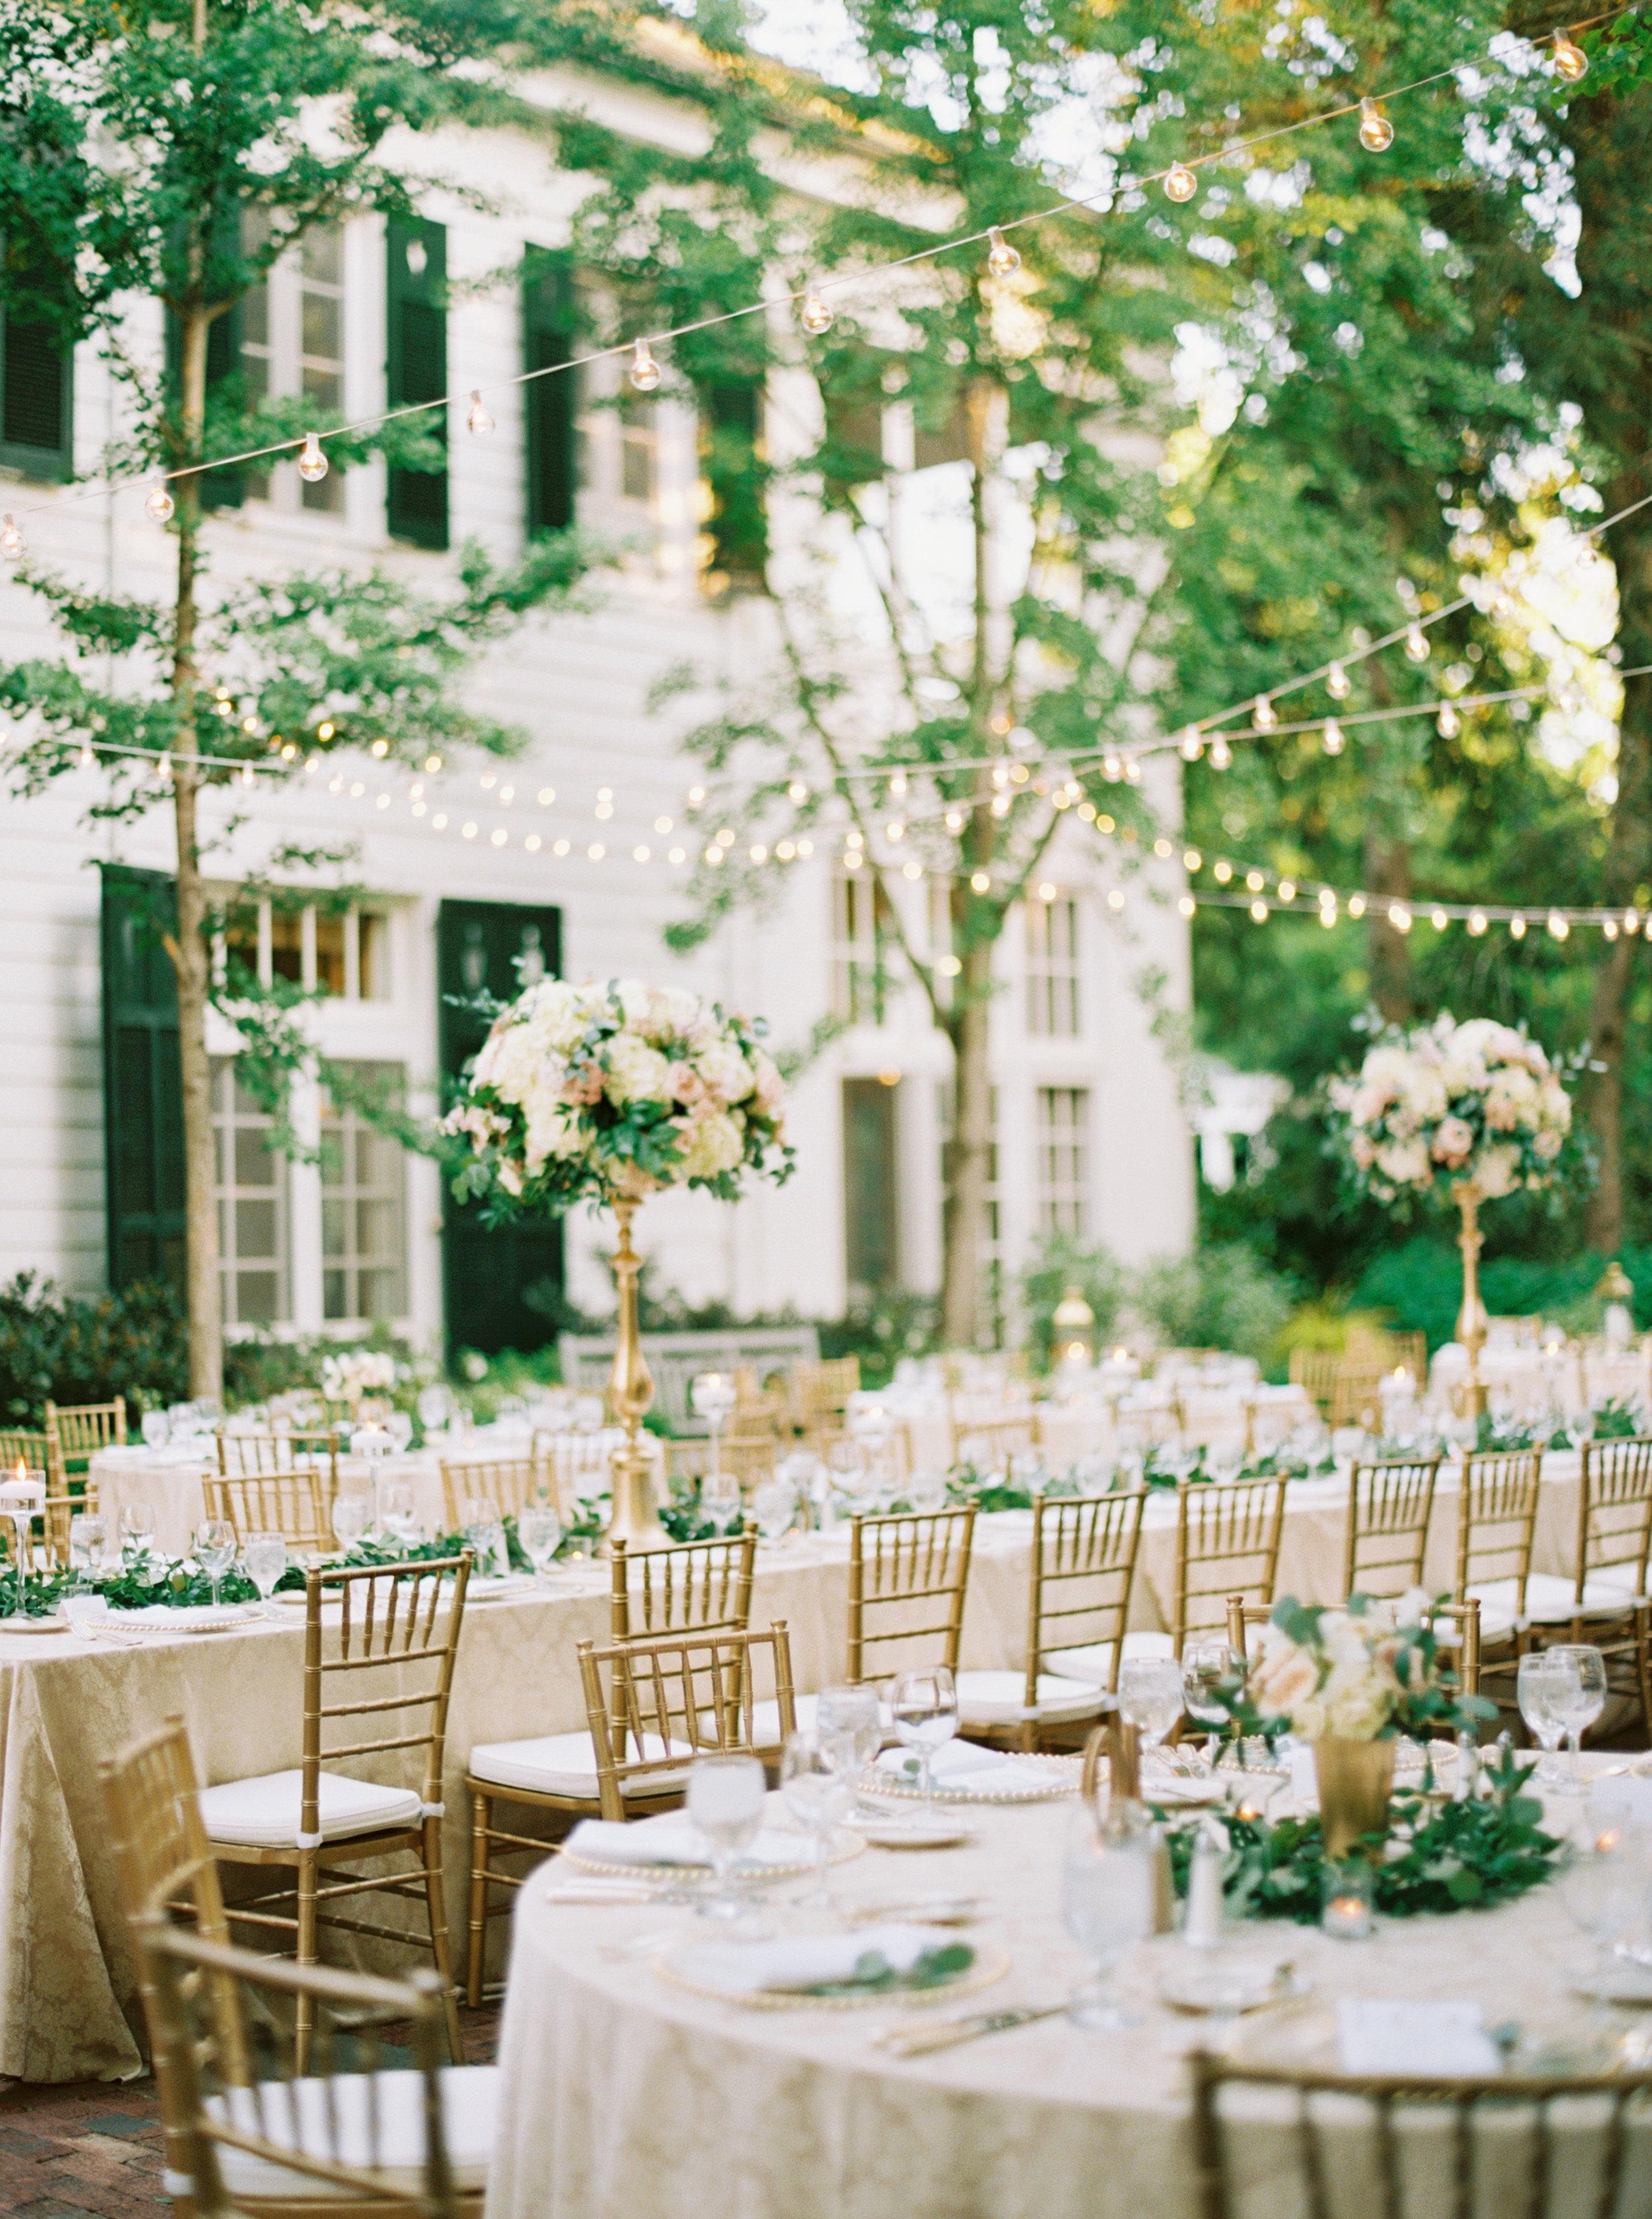 Marie_Perry_Duke_Mansion_Wedding_Charlotte_NC_Abigail_Malone_Photography-531.jpg